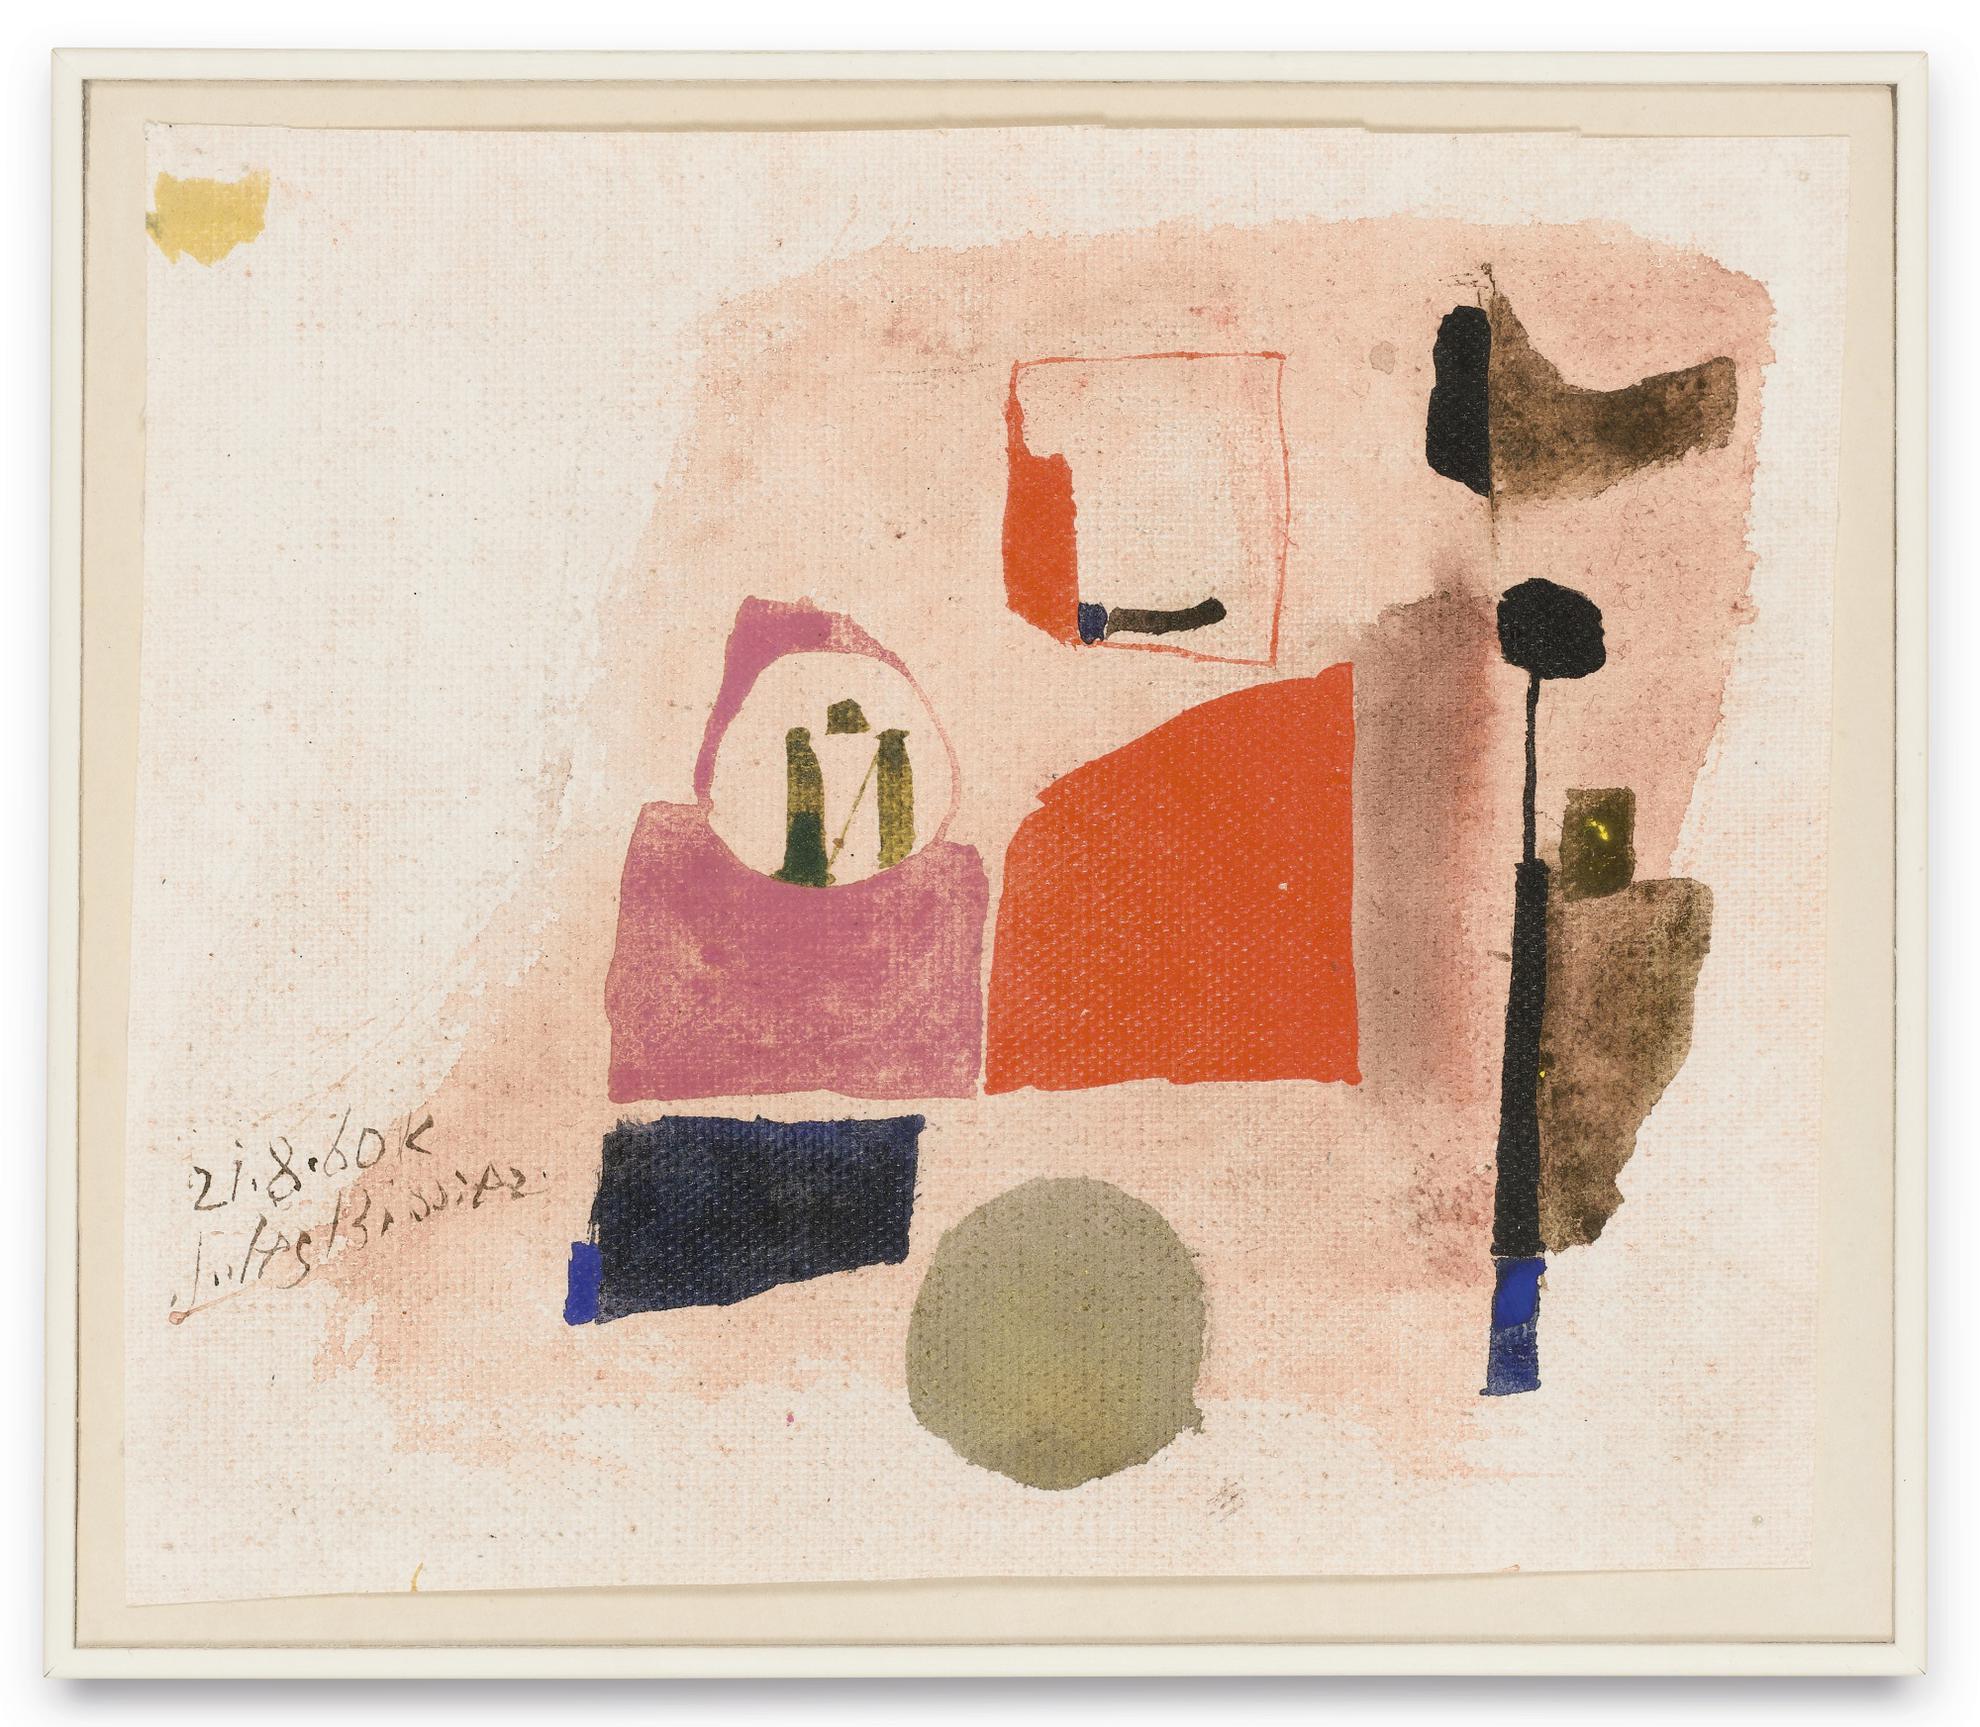 Julius Bissier-21.8.60.K-1960